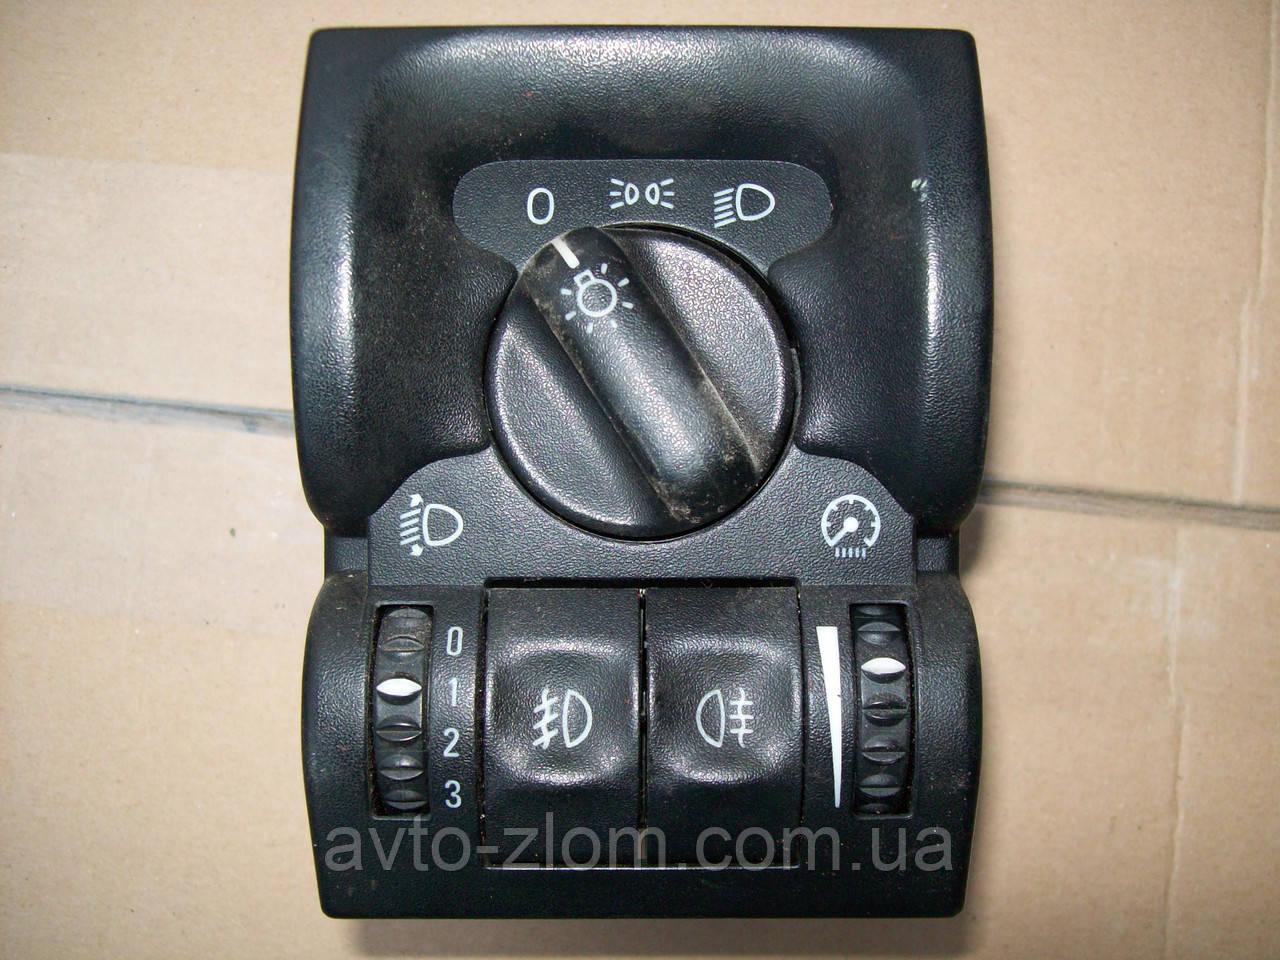 Переключатель света фар Opel Vectra - B, Опель Вектра Б.